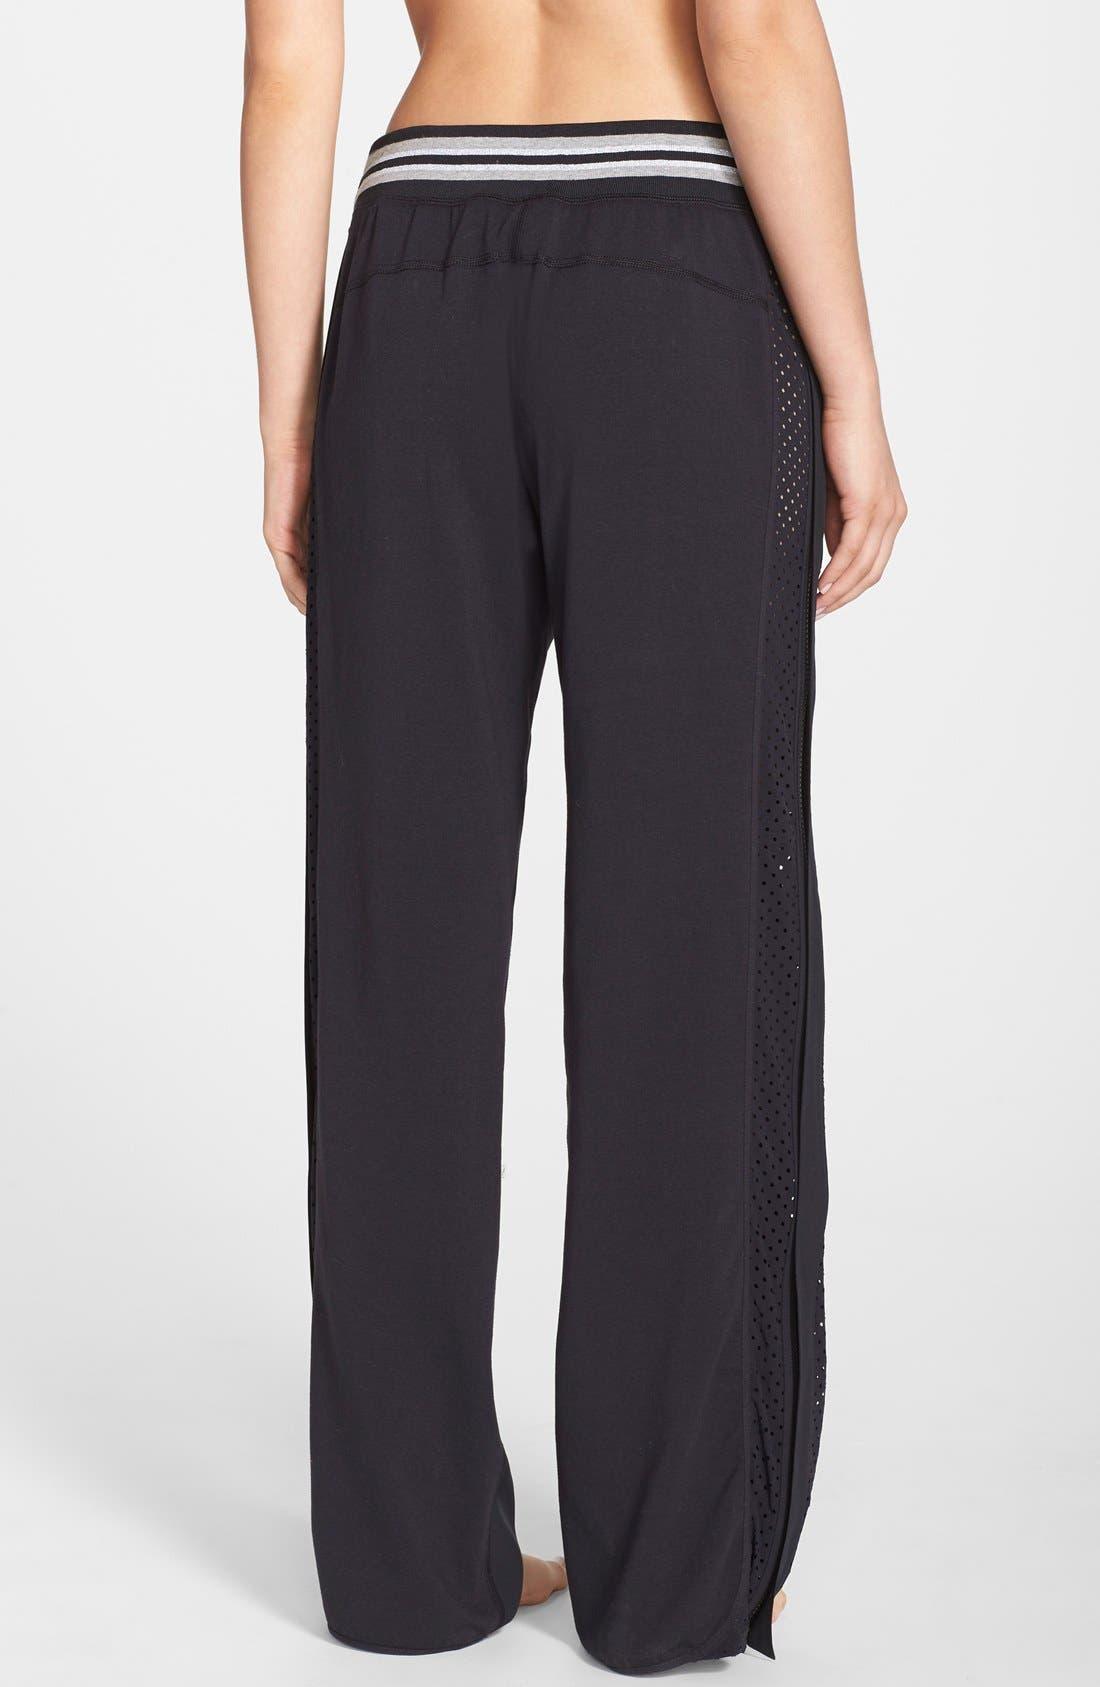 Alternate Image 2  - Zella Side Zip Track Pants